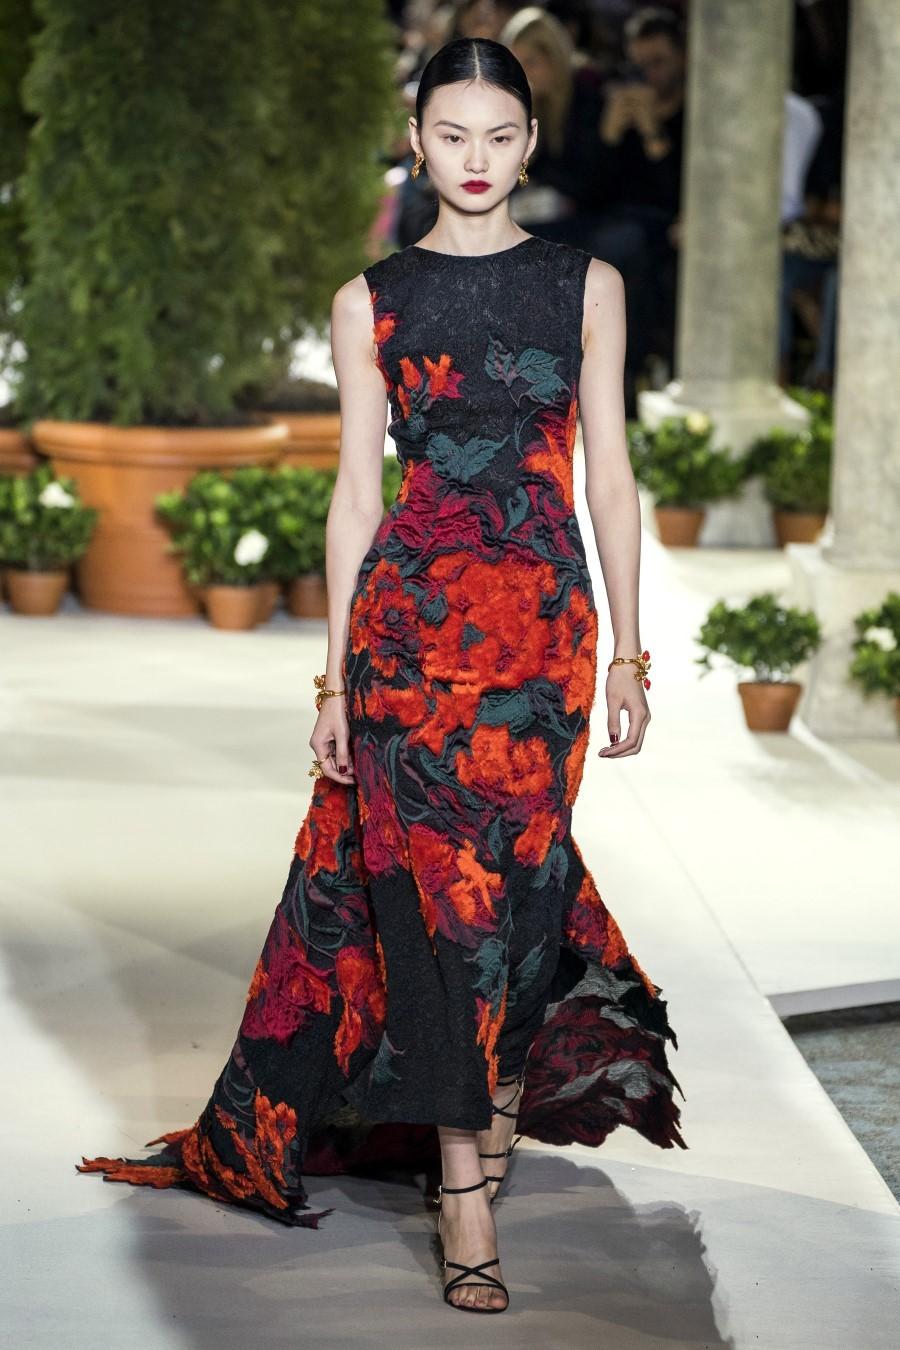 Oscar de la Renta Fall Winter 2019 - New York Fashion Week